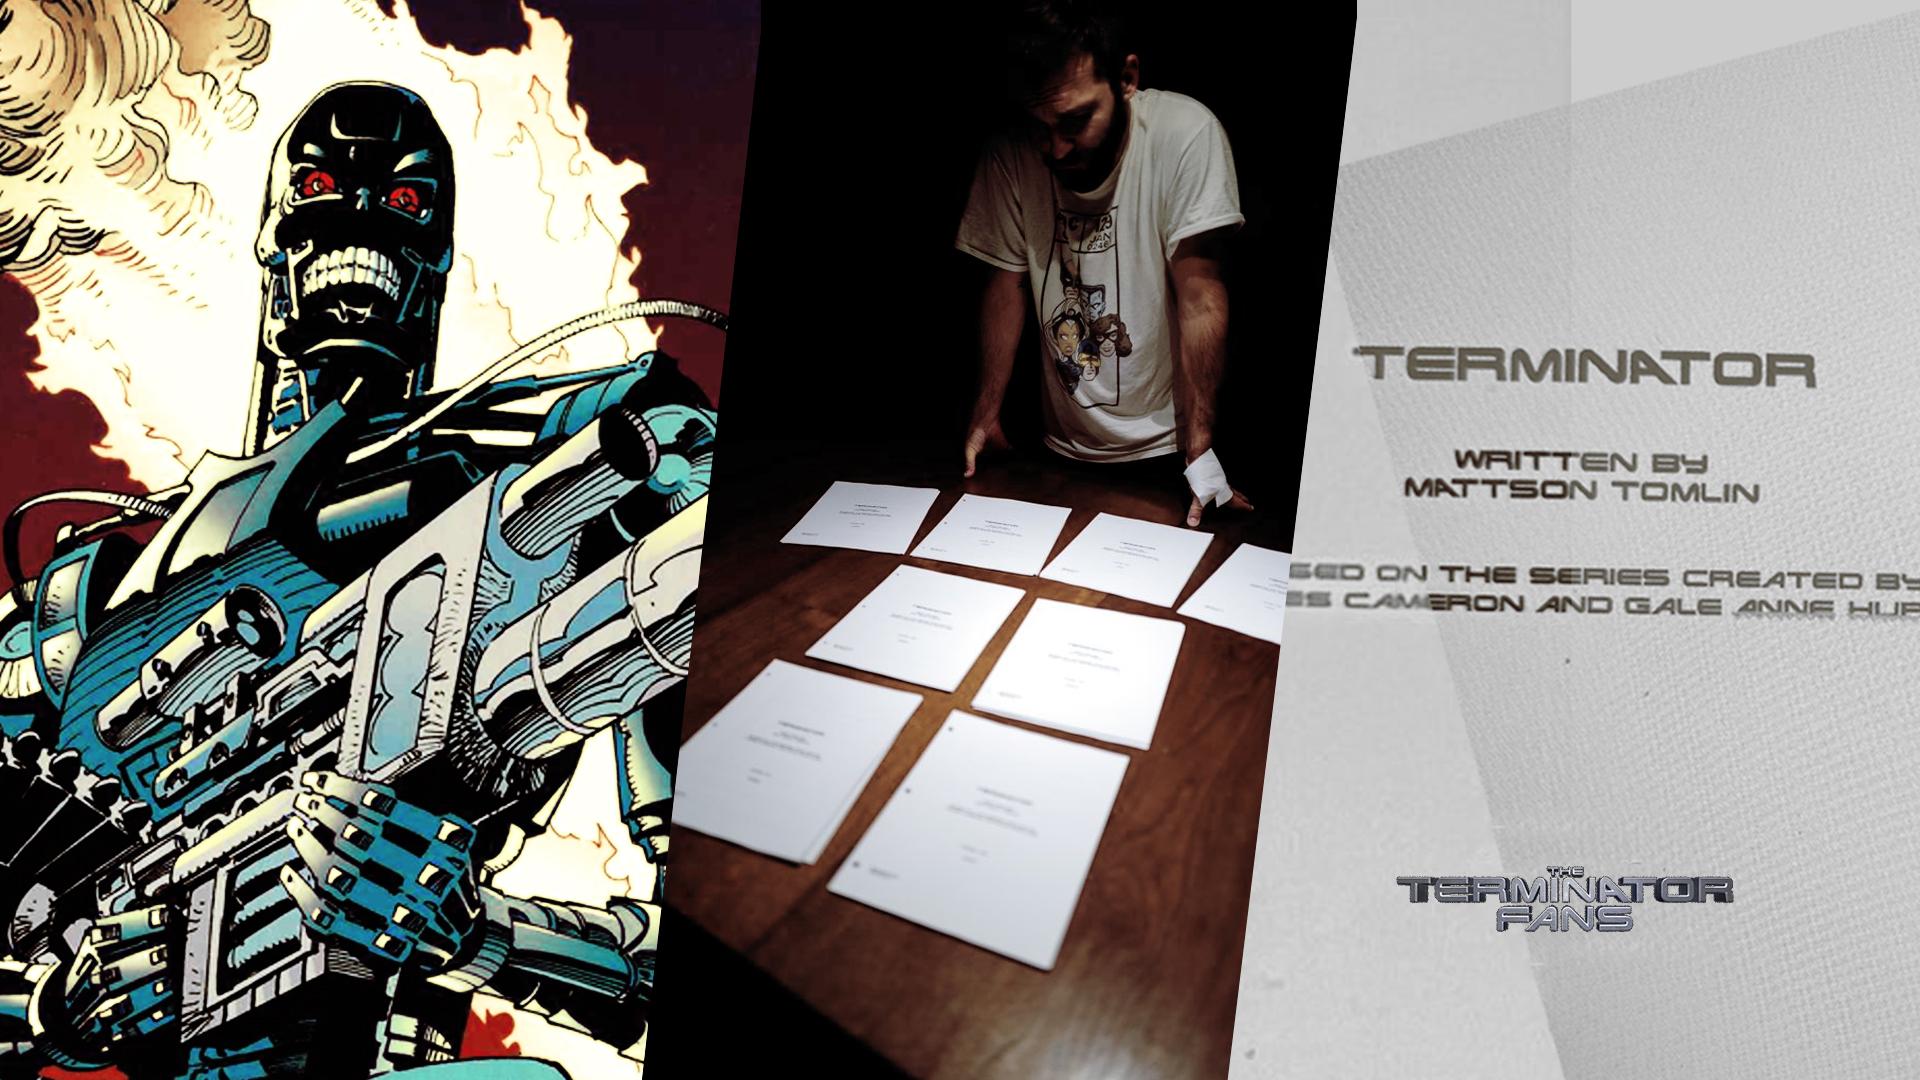 Terminator Anime: Mattson Tomlin Completes Season One Scripts